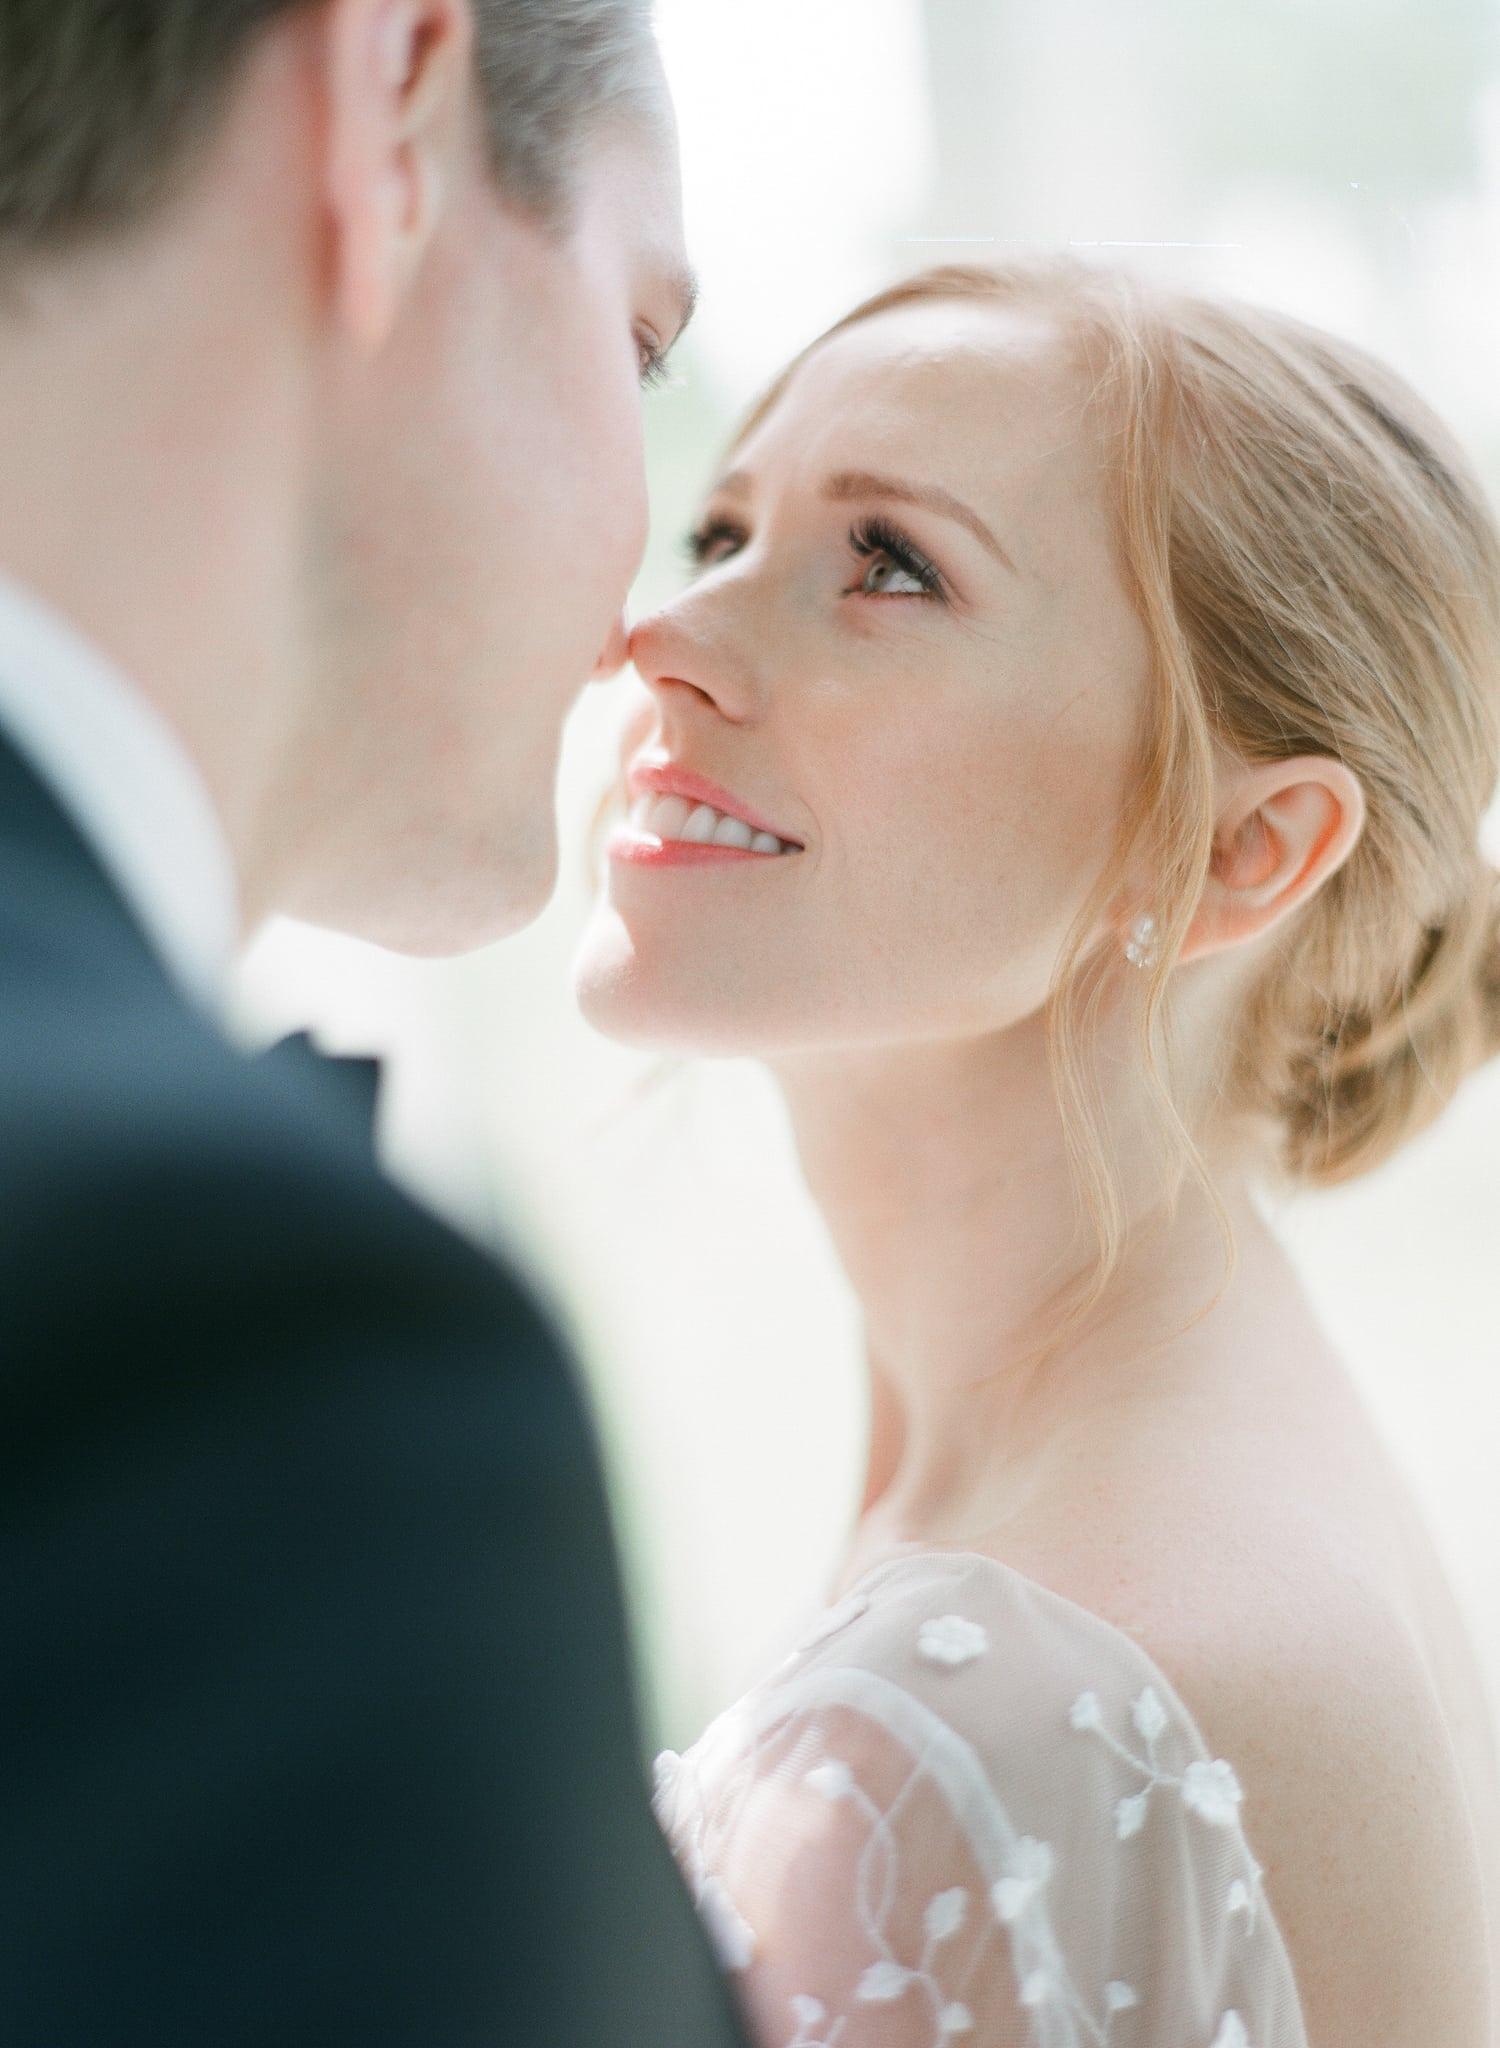 PROSPECT_HOUSE_WEDDING_AUSTIN_TX_MATTHEW_MOORE-00193.jpg